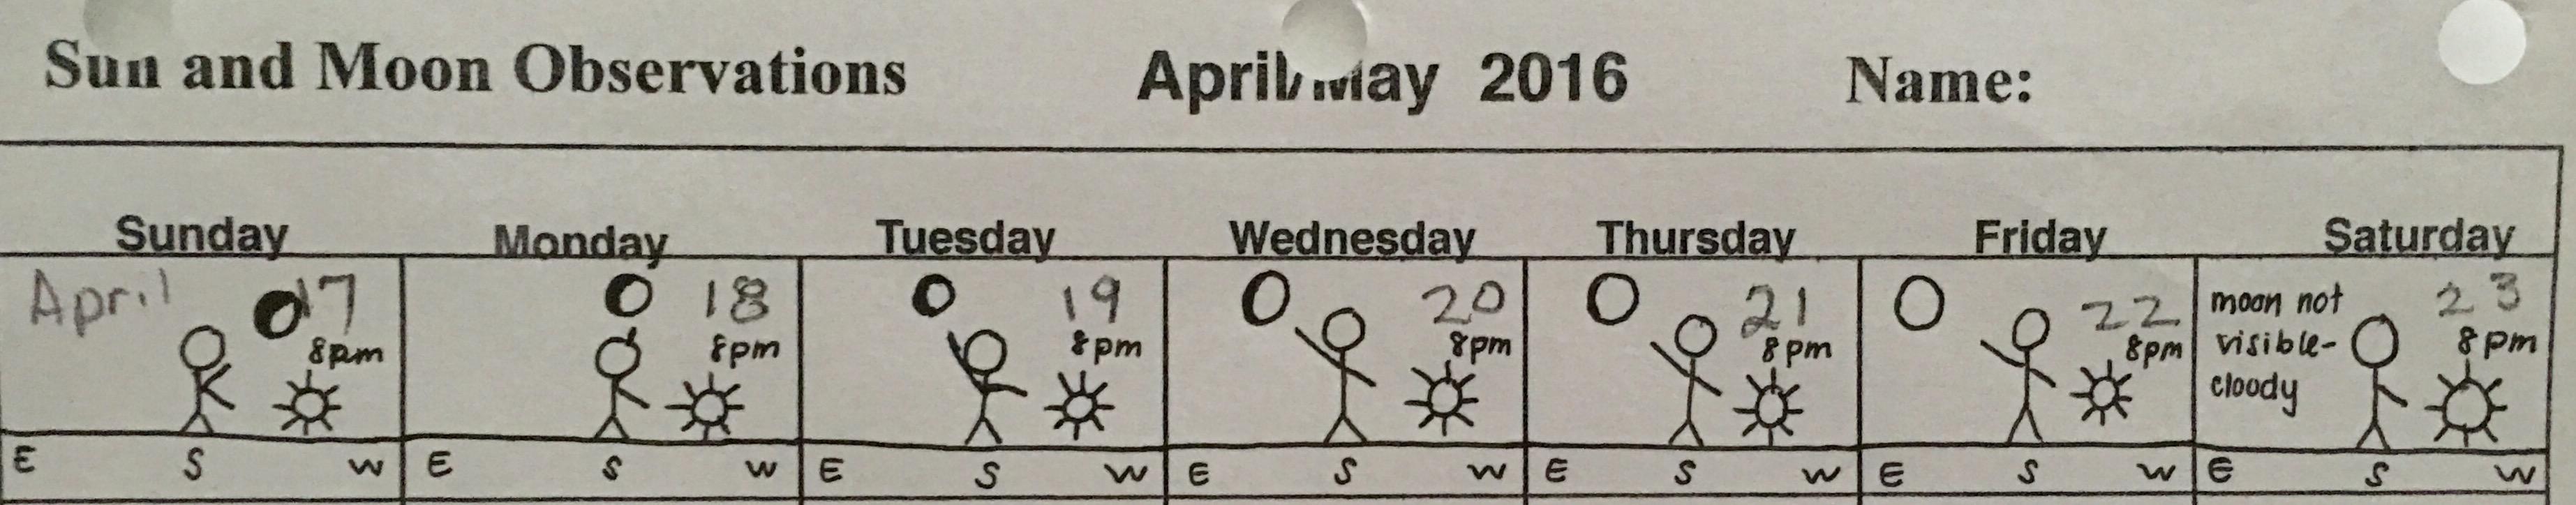 Student's Observations, April 17-23, 2016